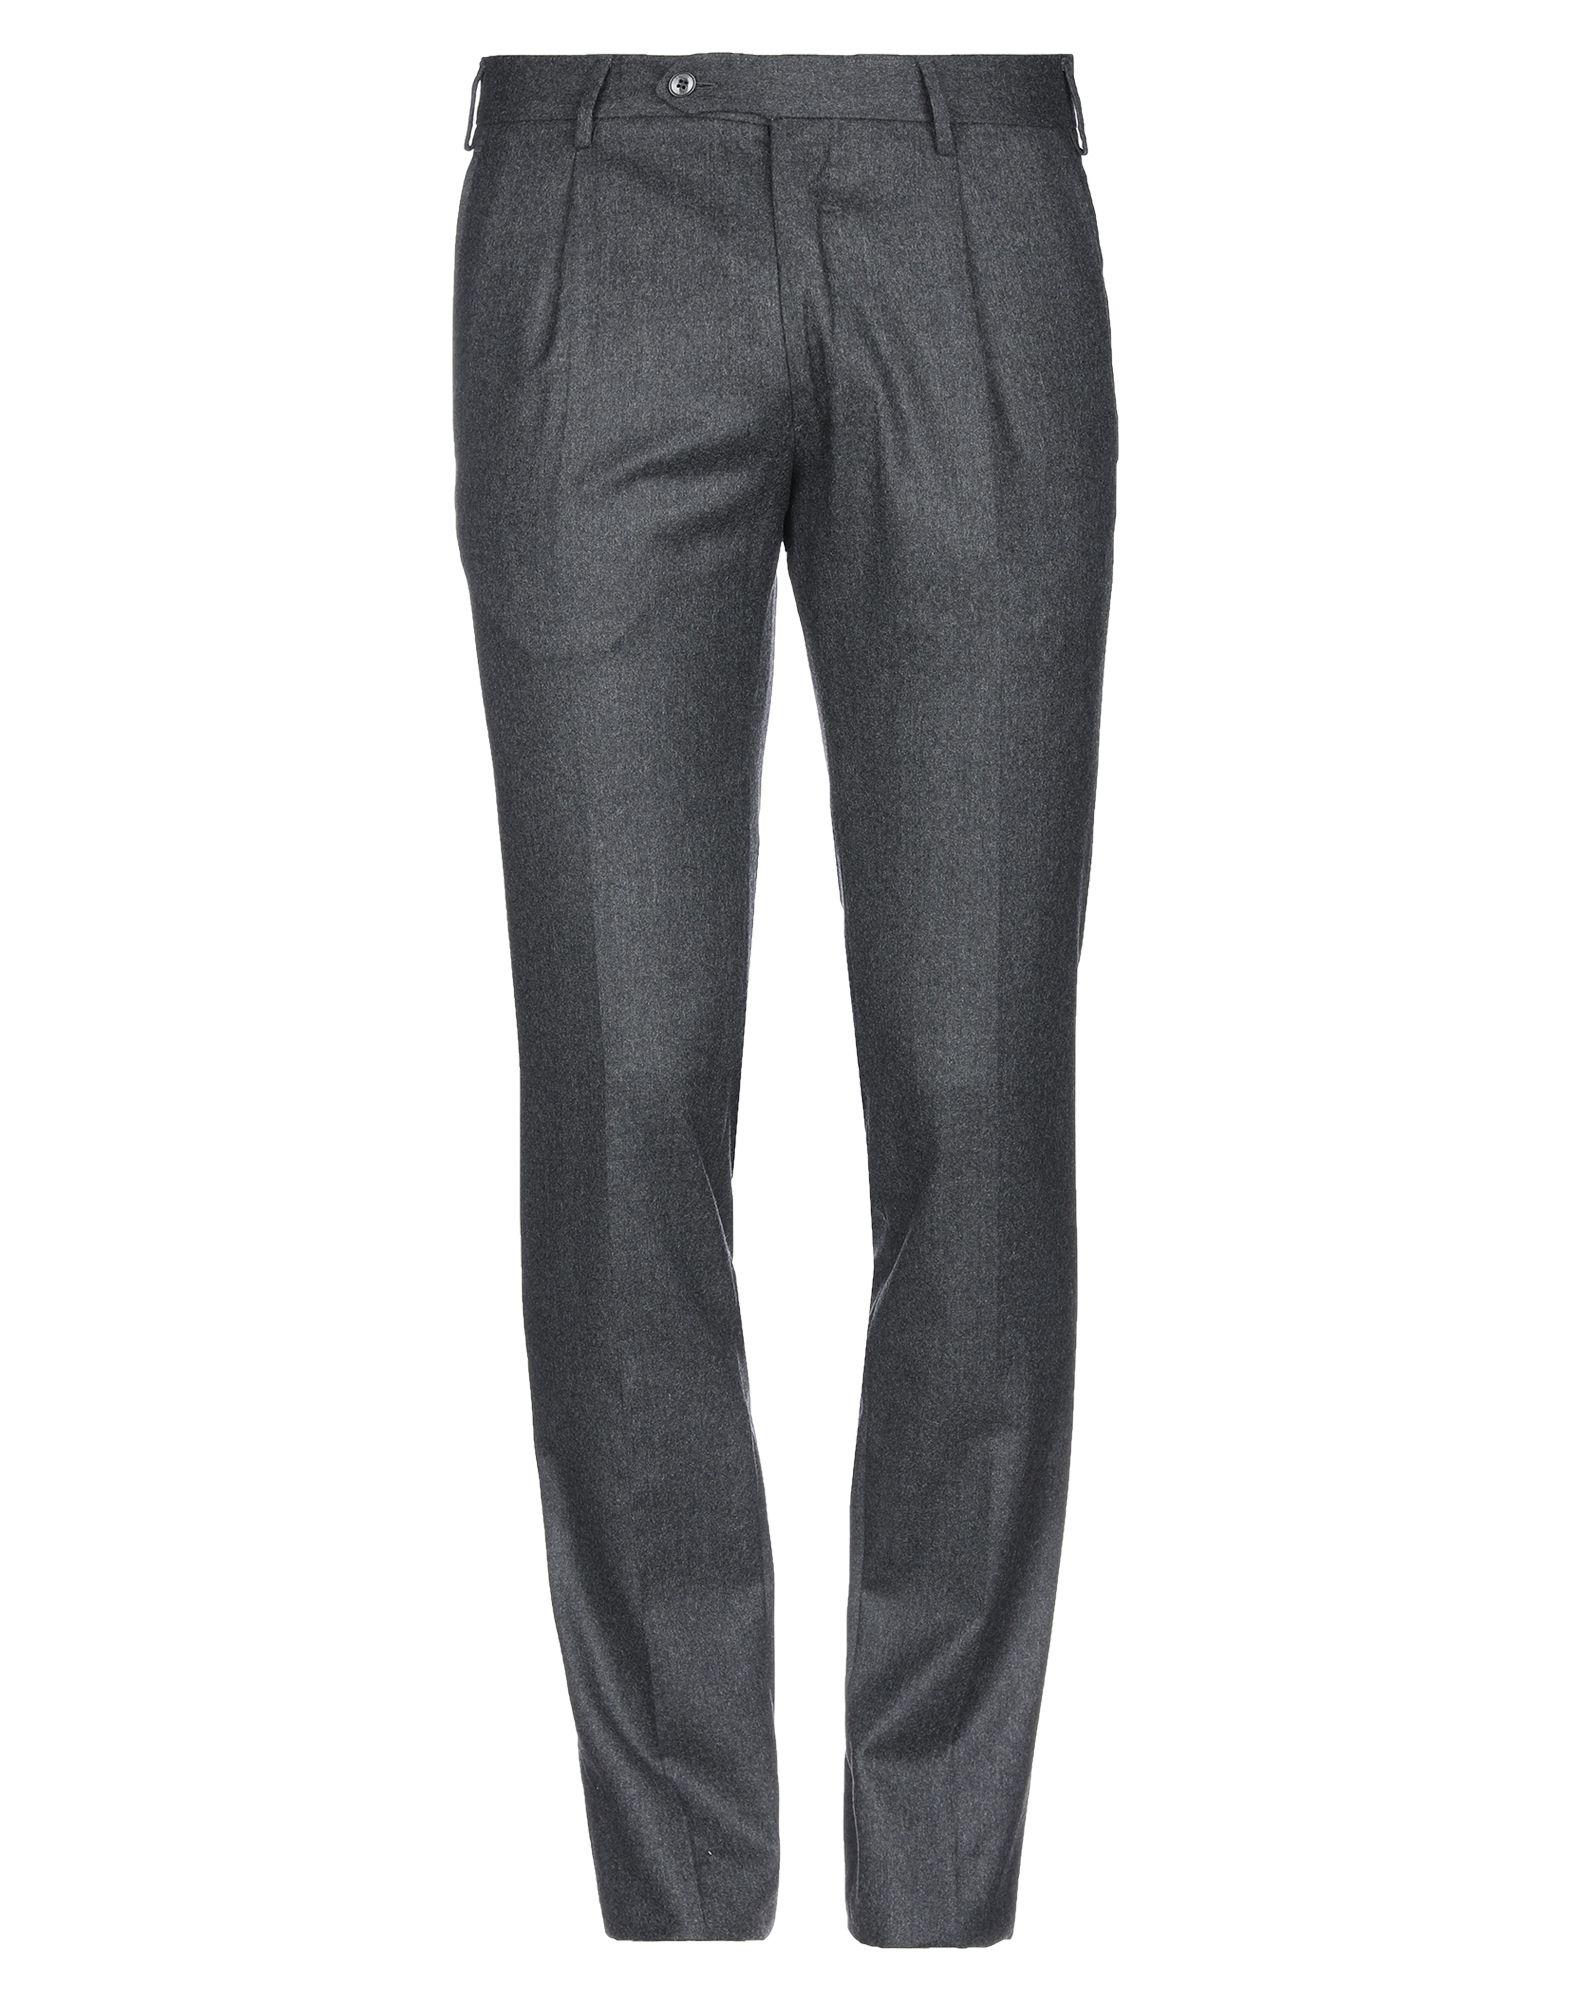 Pantalone Vitale Barberis Canonico herren - 13364148XP